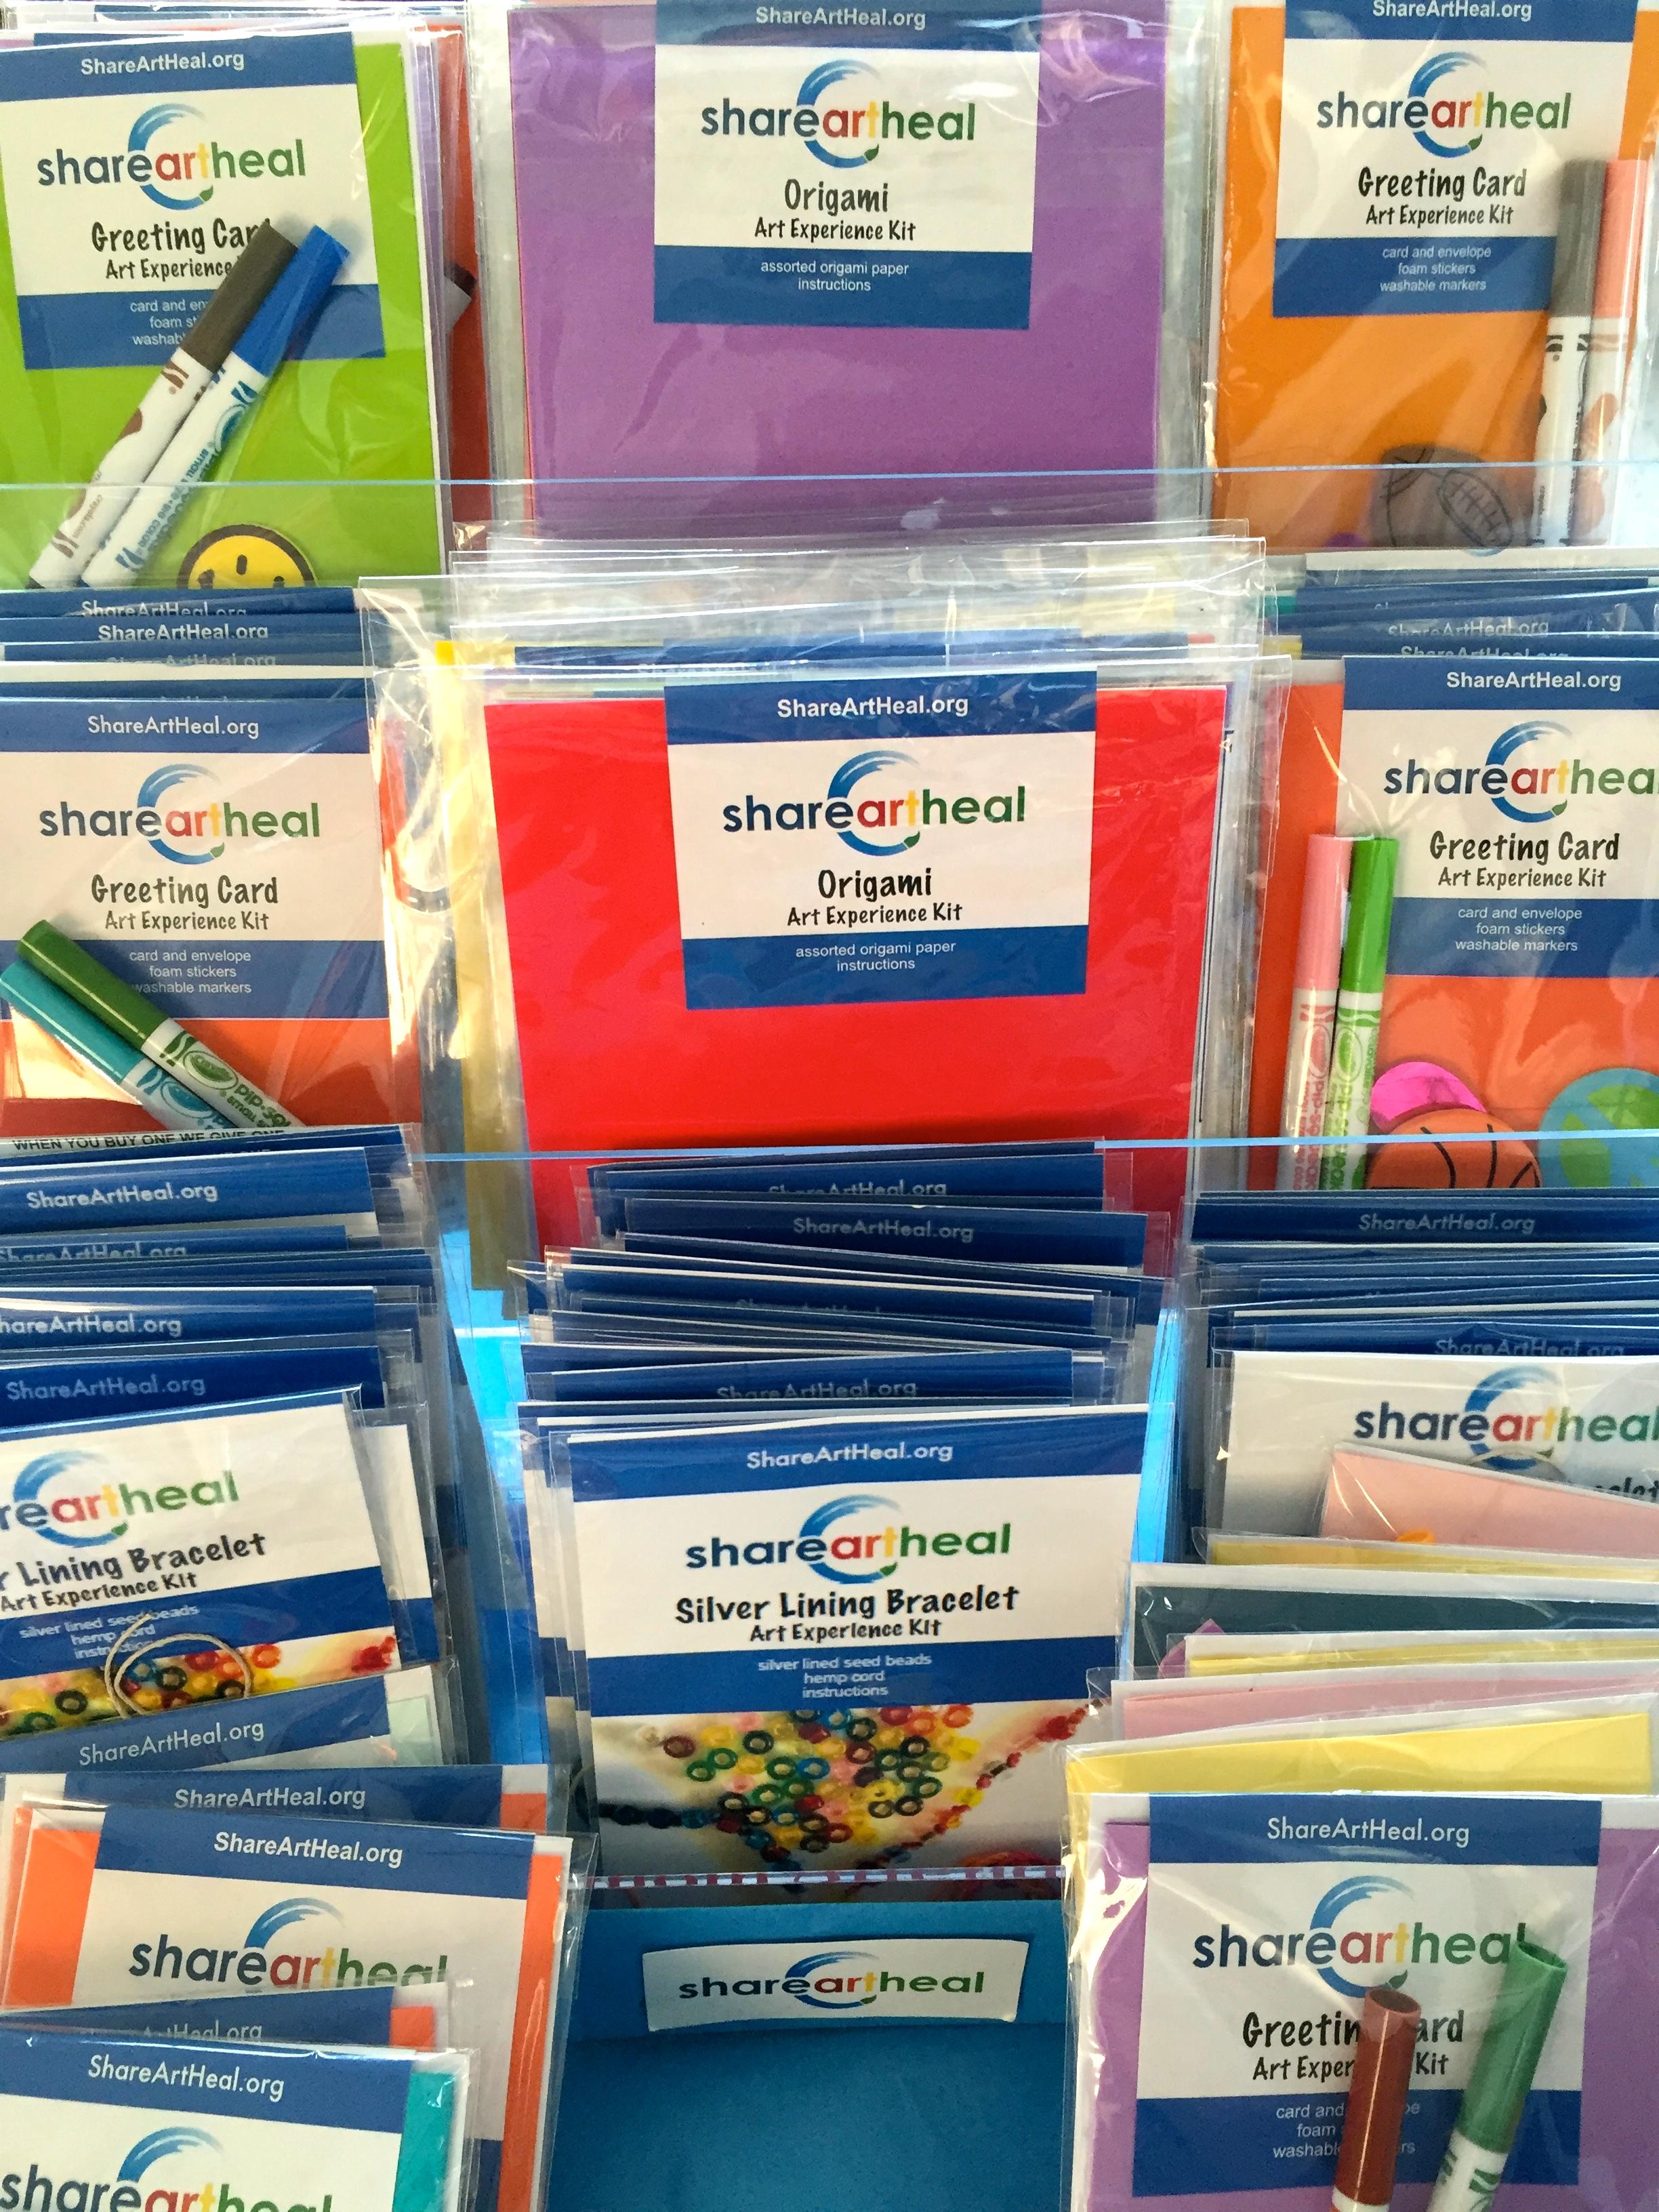 Origami Art Experience Kit